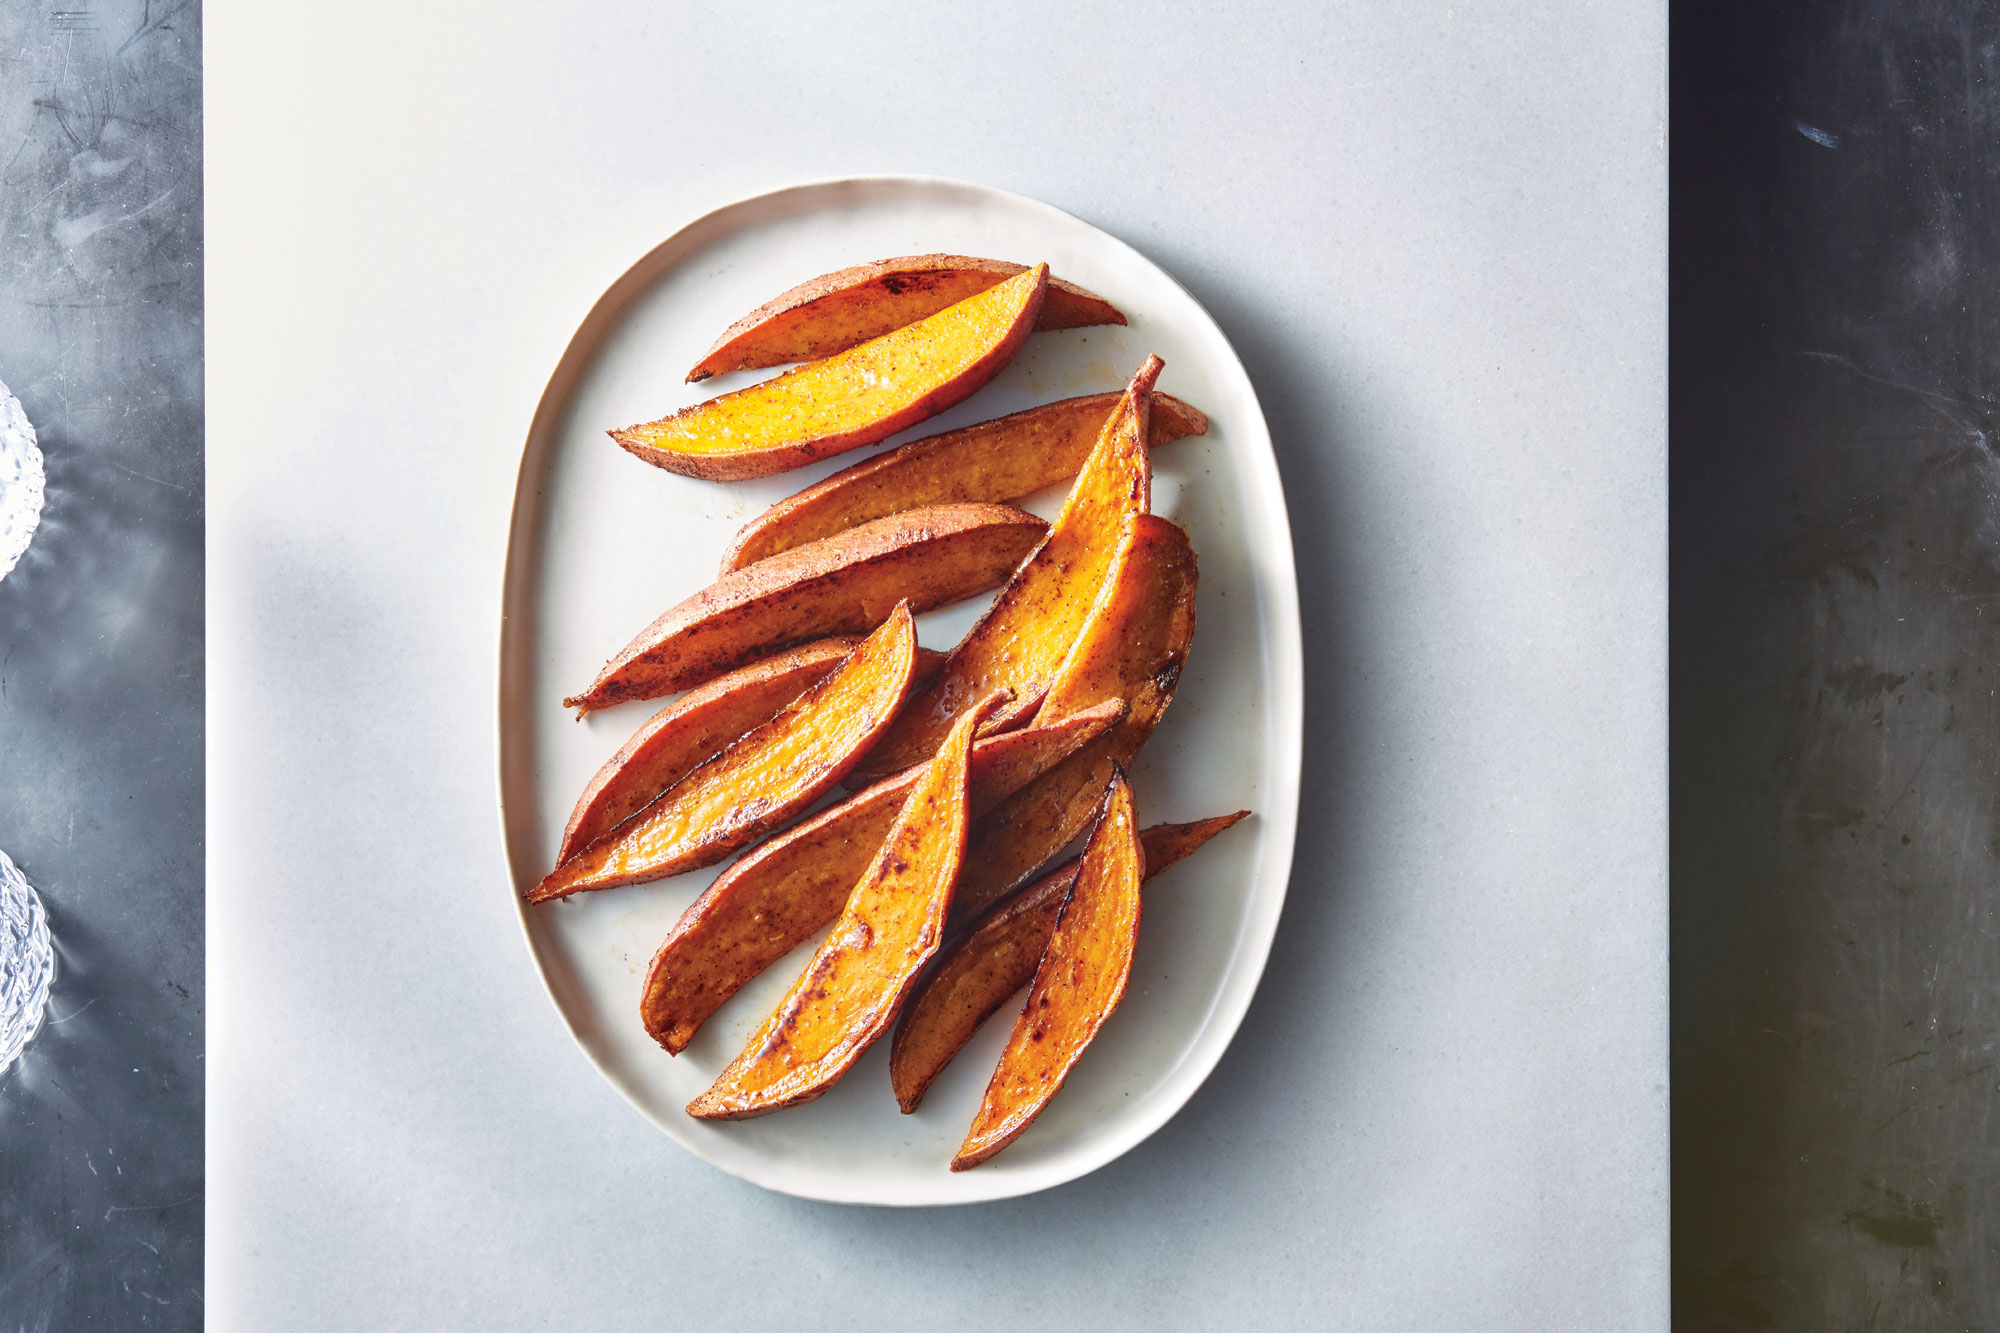 ck- Spicy Sweet Potato Wedges